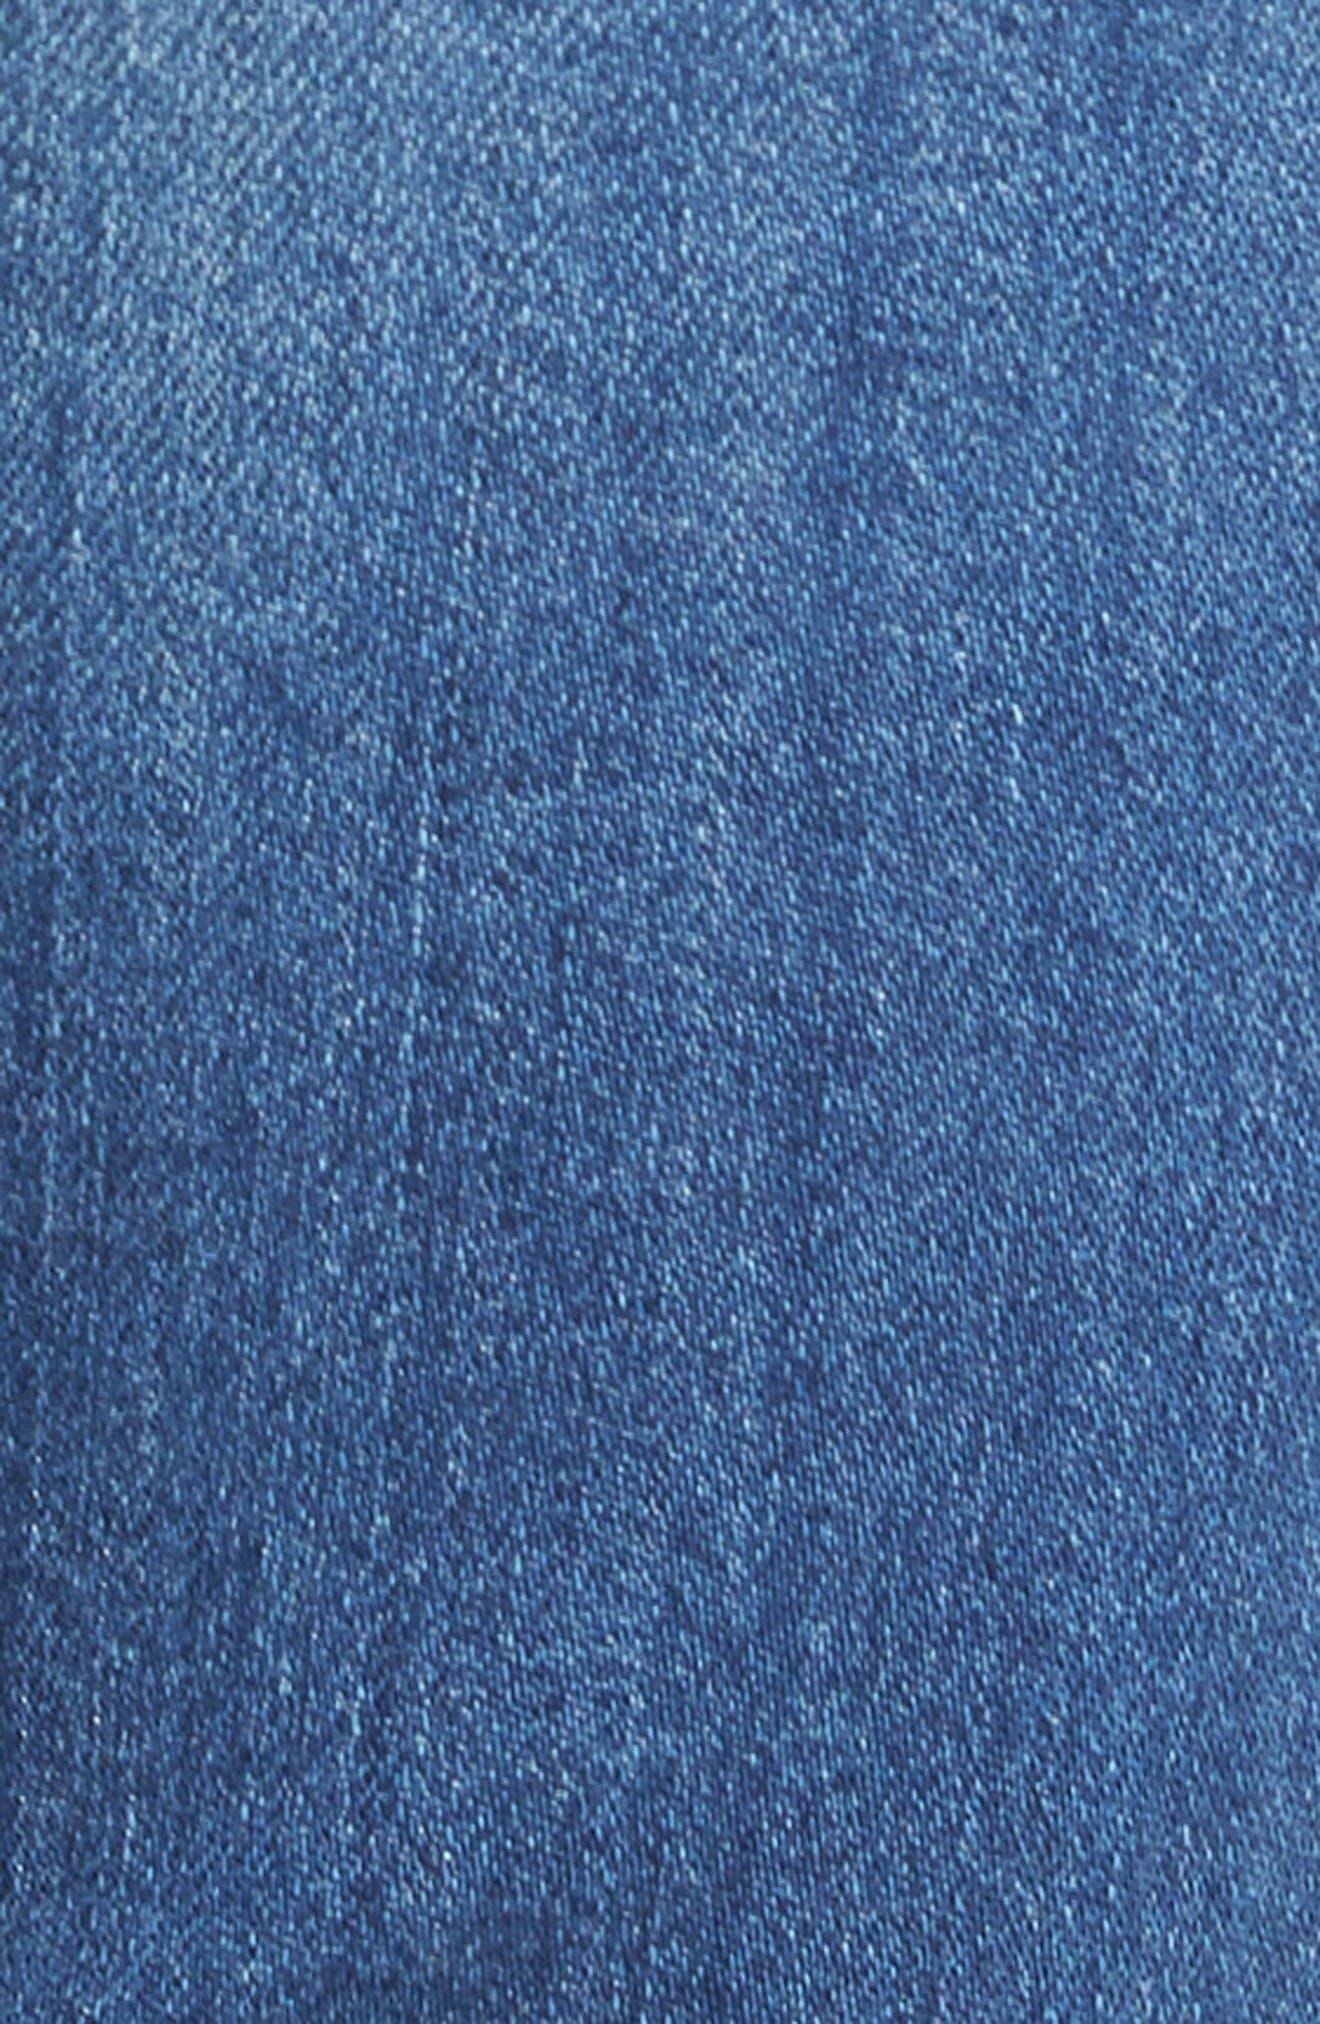 Alternate Image 5  - KUT from the Kloth Catherine Distressed Boyfriend Jeans (Fiery) (Regular & Petite)